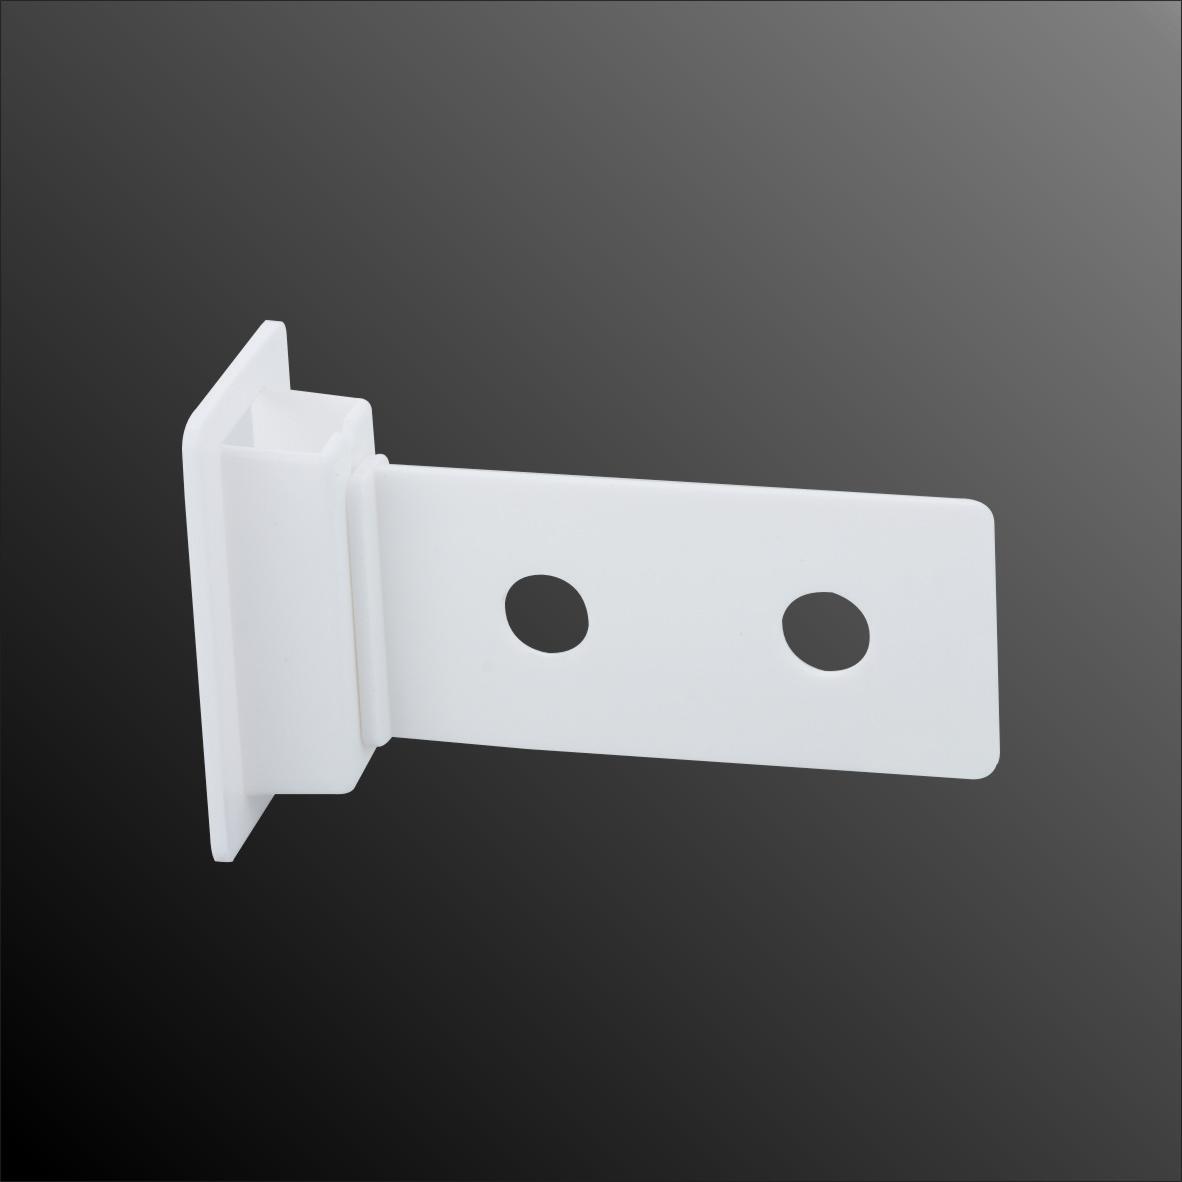 Acrylic Crystal Clear Latching Shelf Protagonist with Locker